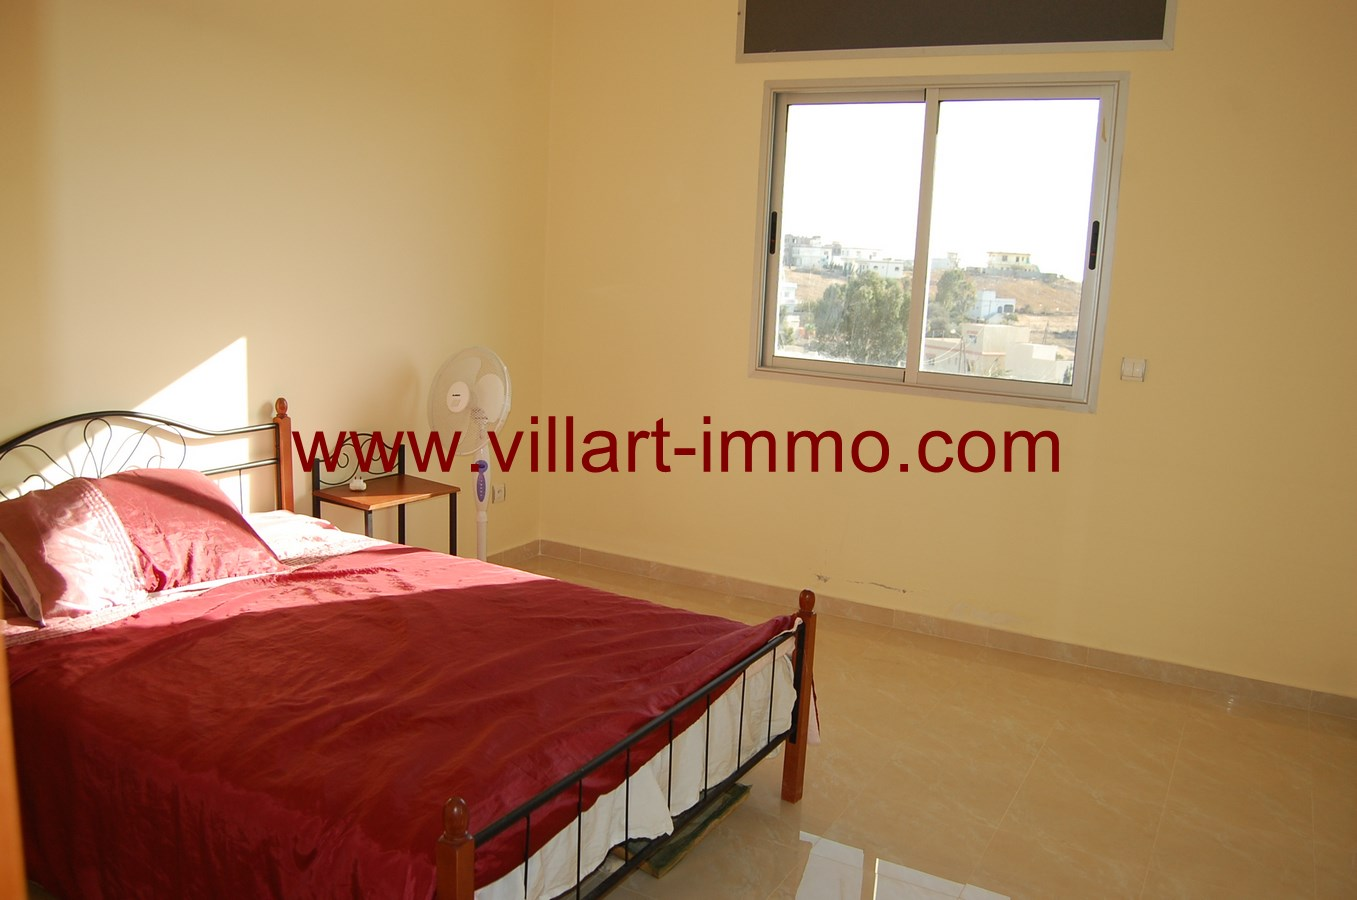 5-vente-maison-tanger-jbilat-chambre-2-vm408-villart-immo